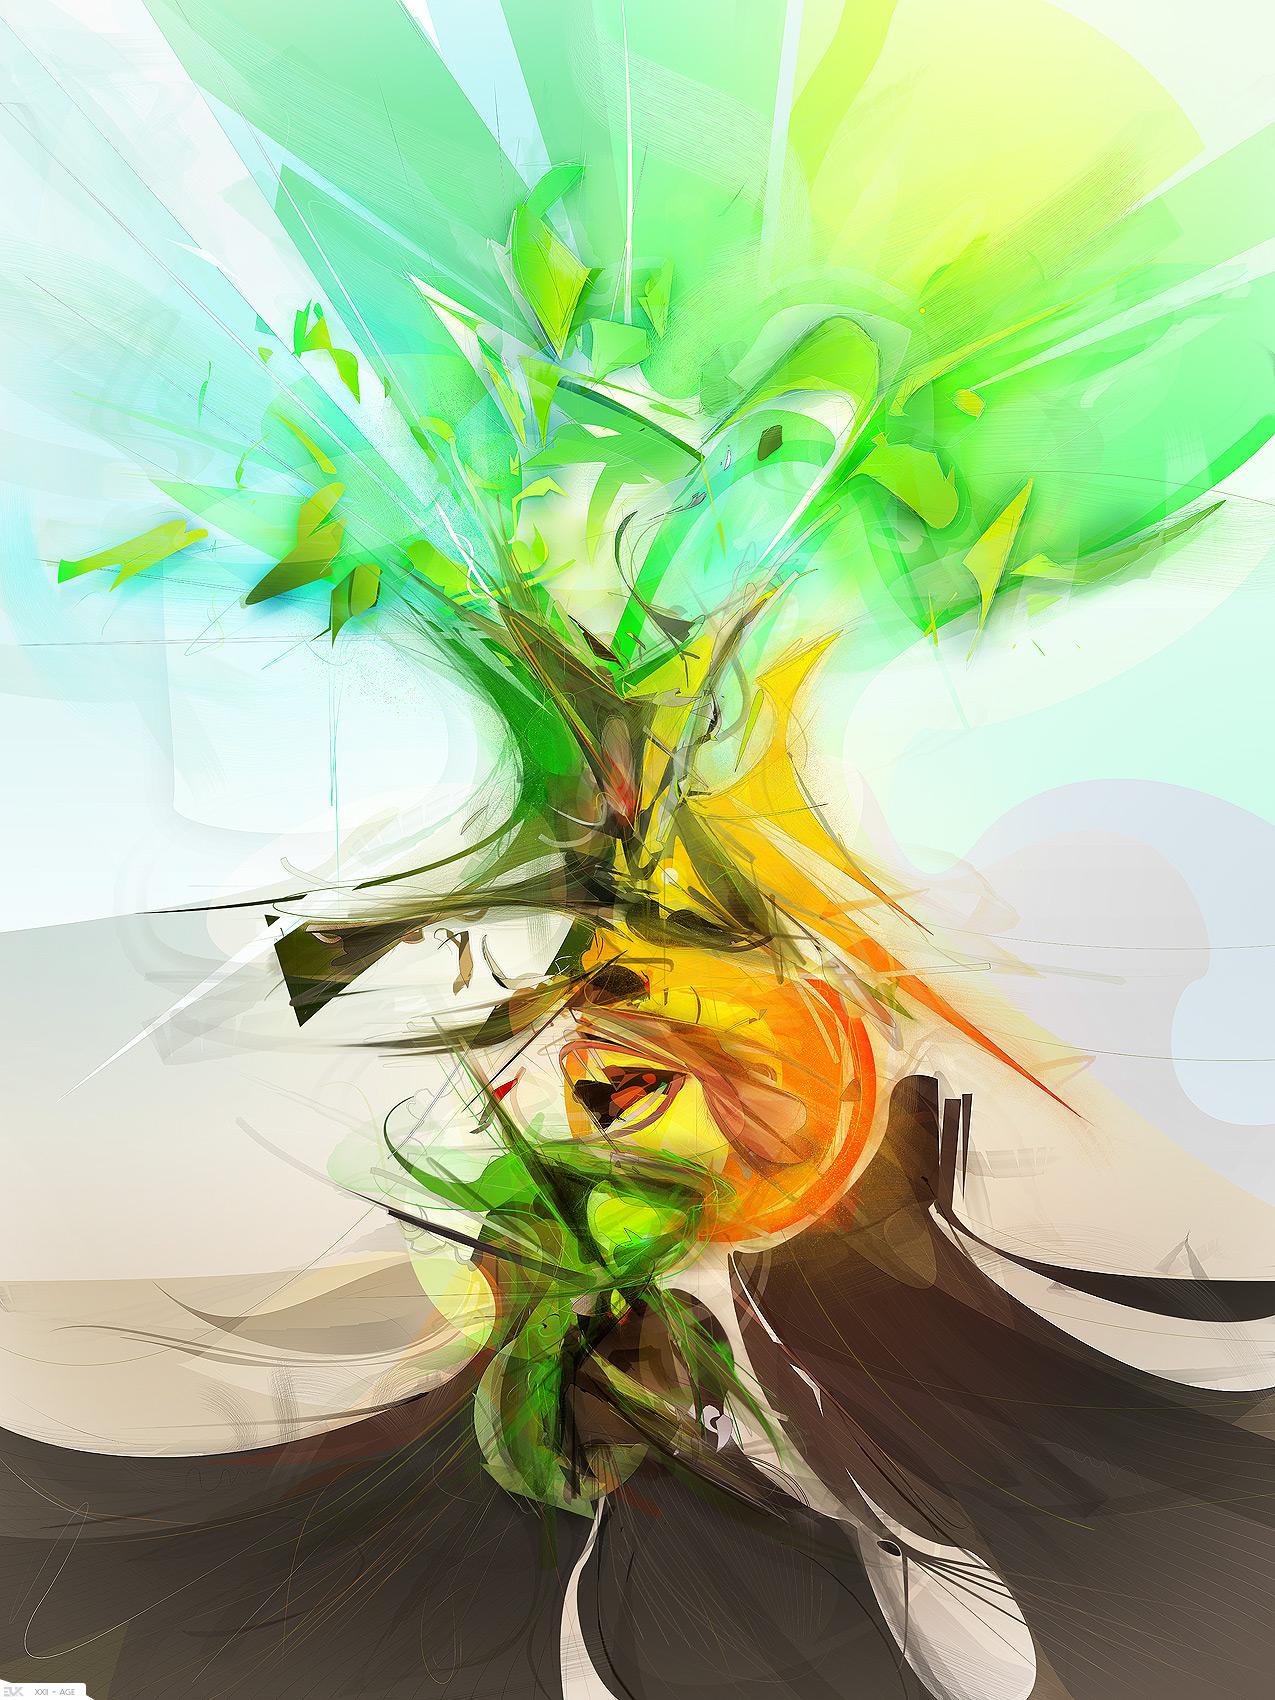 Evoke : digital art